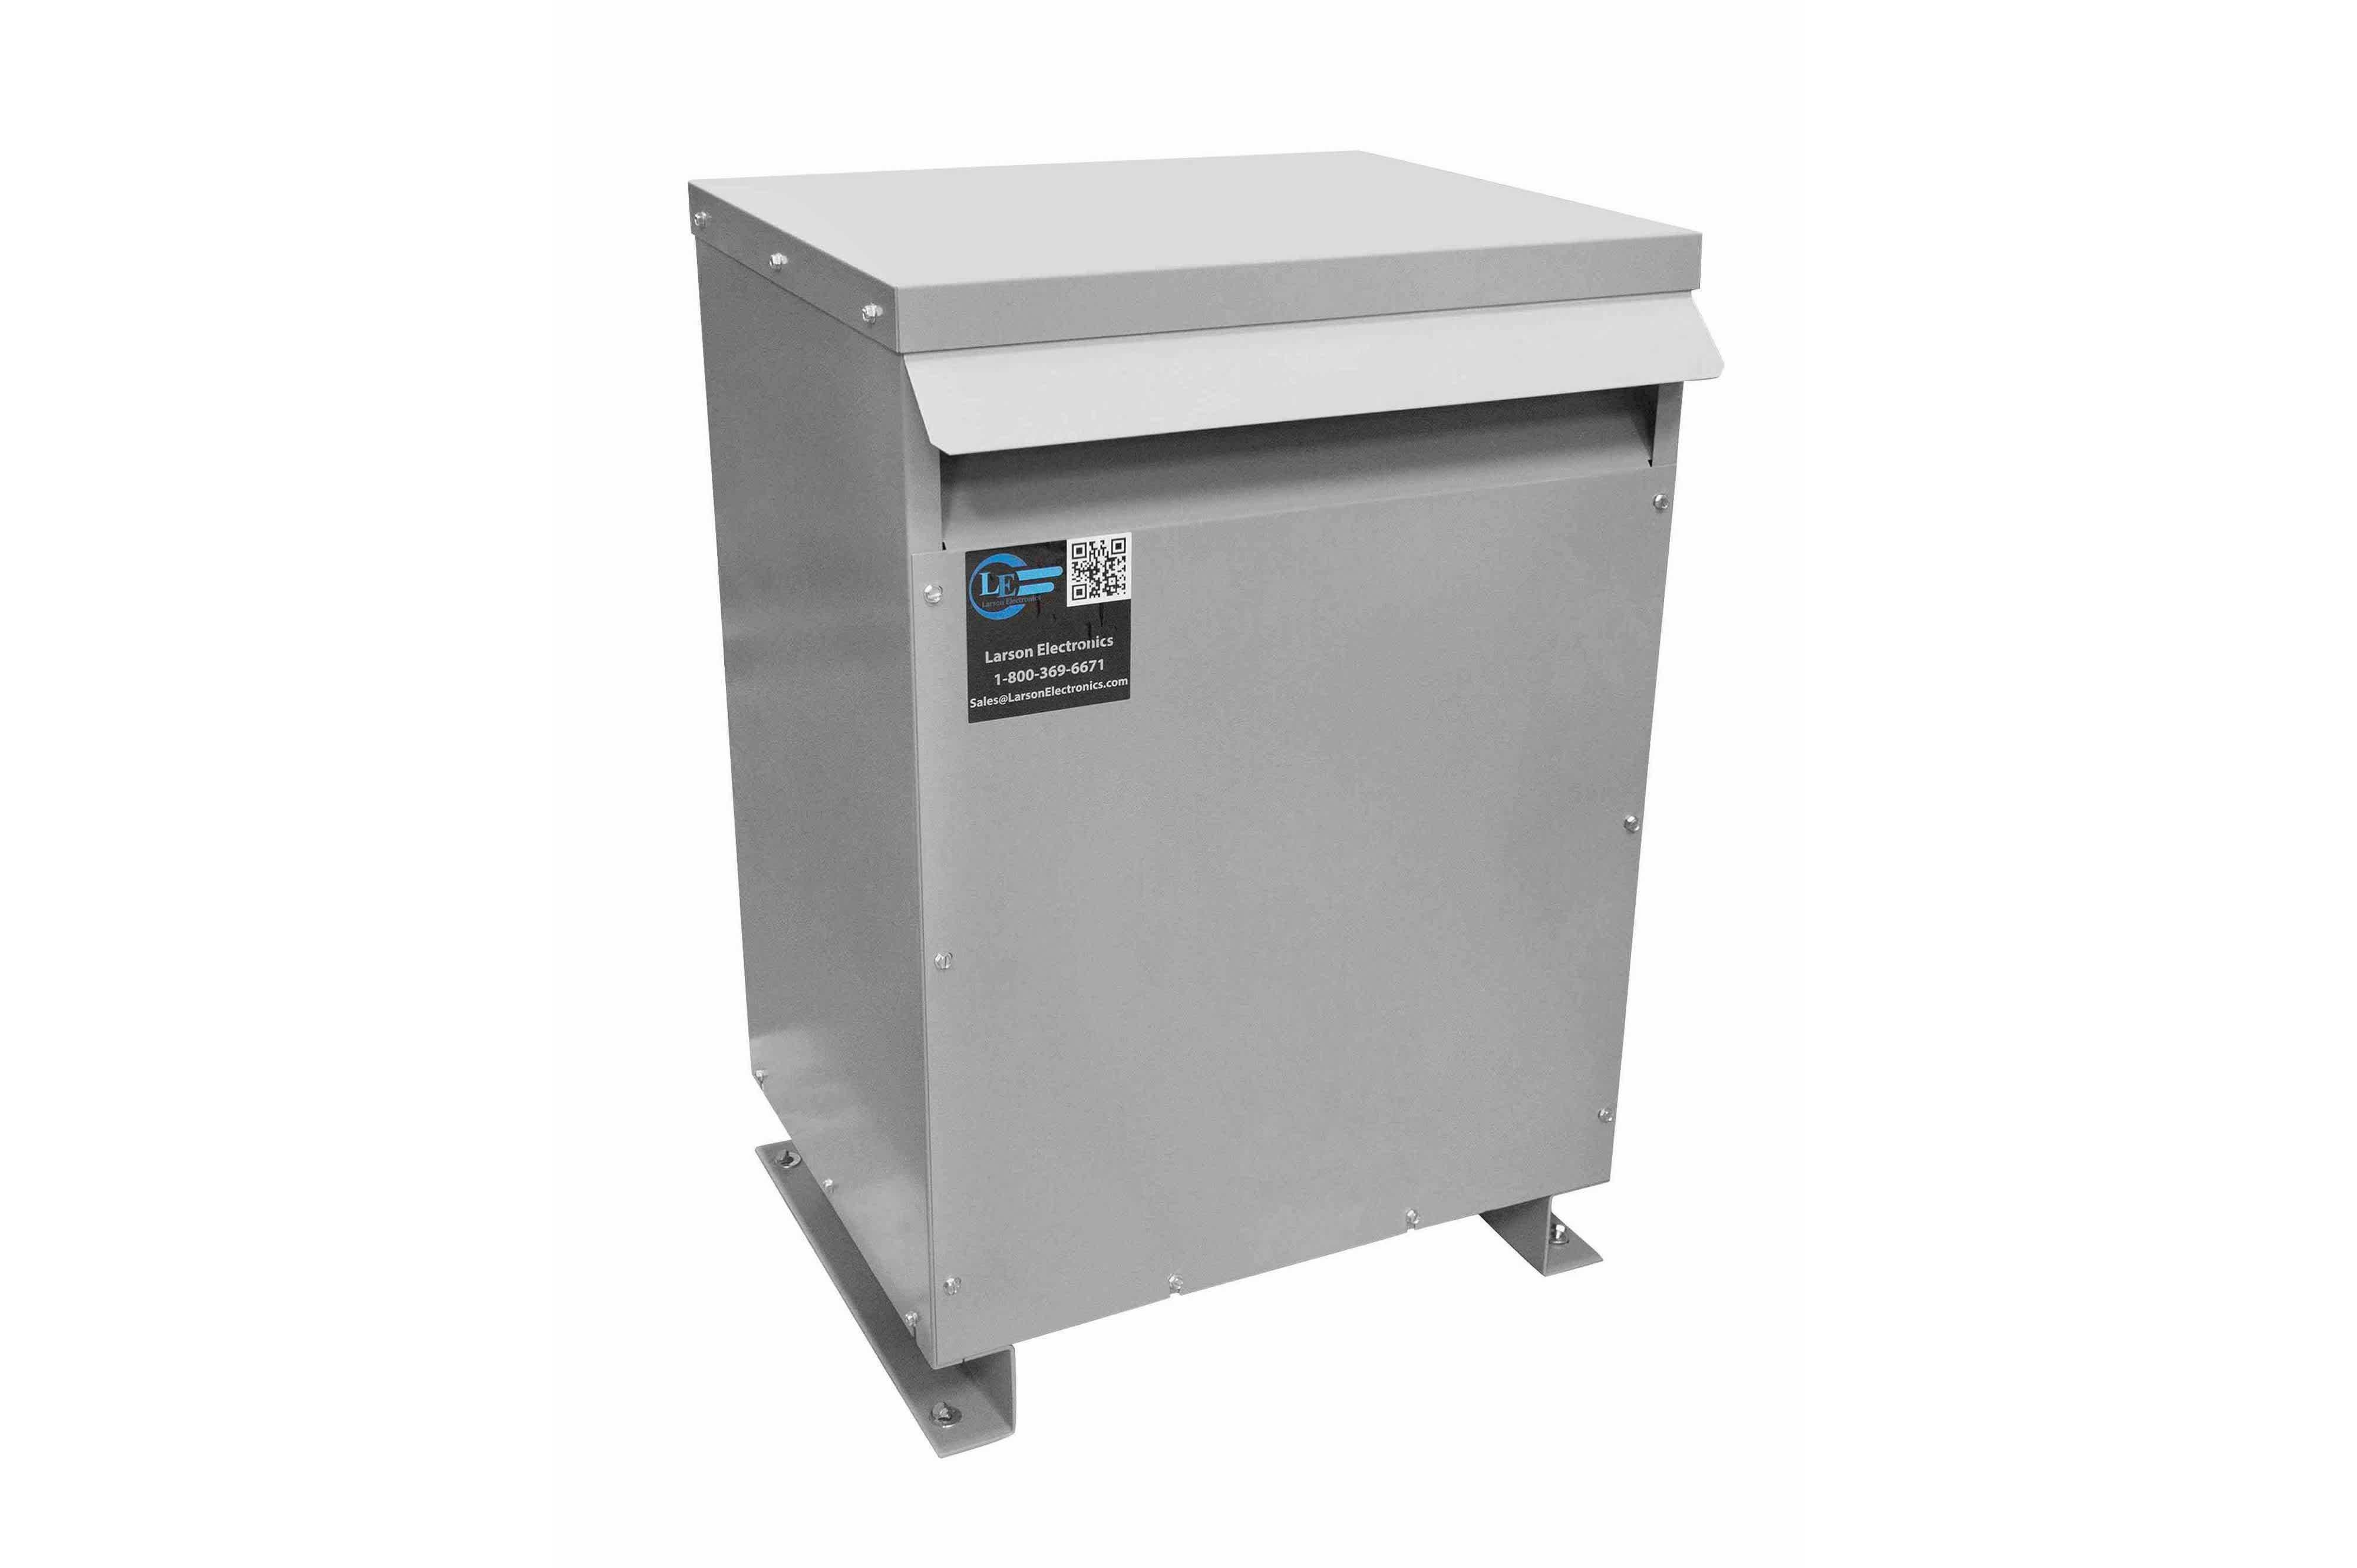 42.5 kVA 3PH Isolation Transformer, 480V Wye Primary, 380V Delta Secondary, N3R, Ventilated, 60 Hz